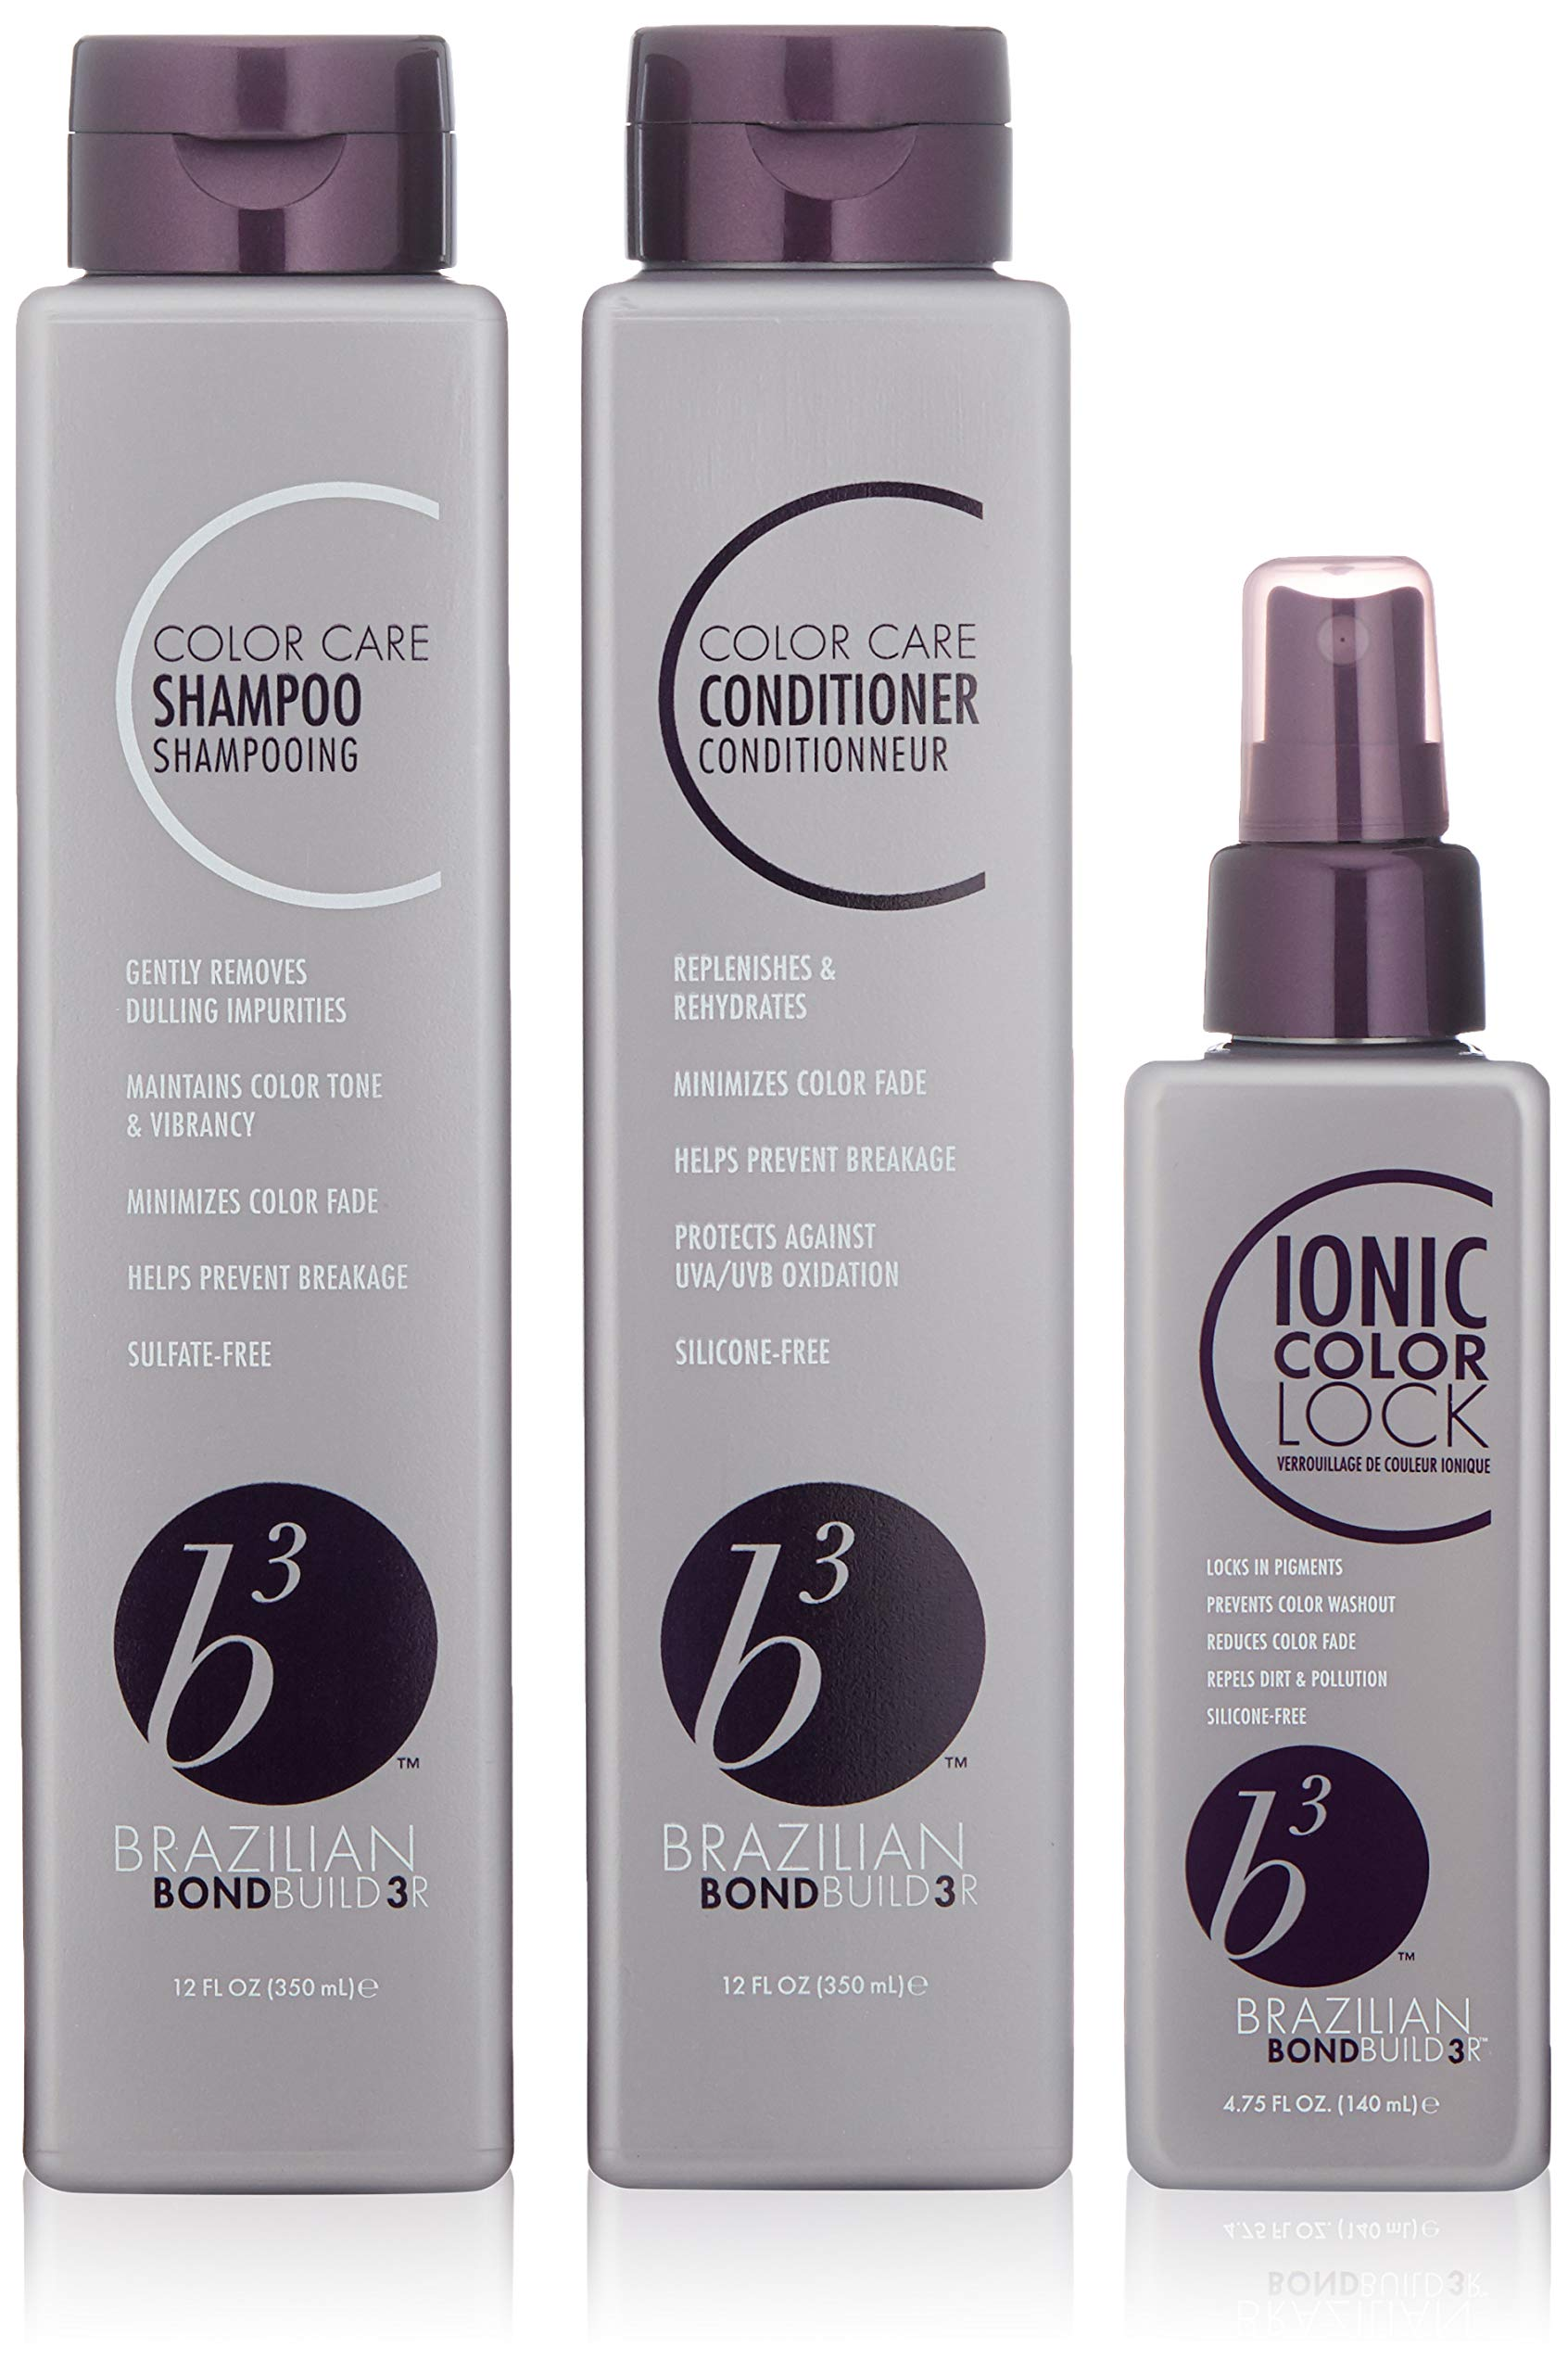 B3 Shampoo/Conditioner/Ionic Color Lock Trio Pack